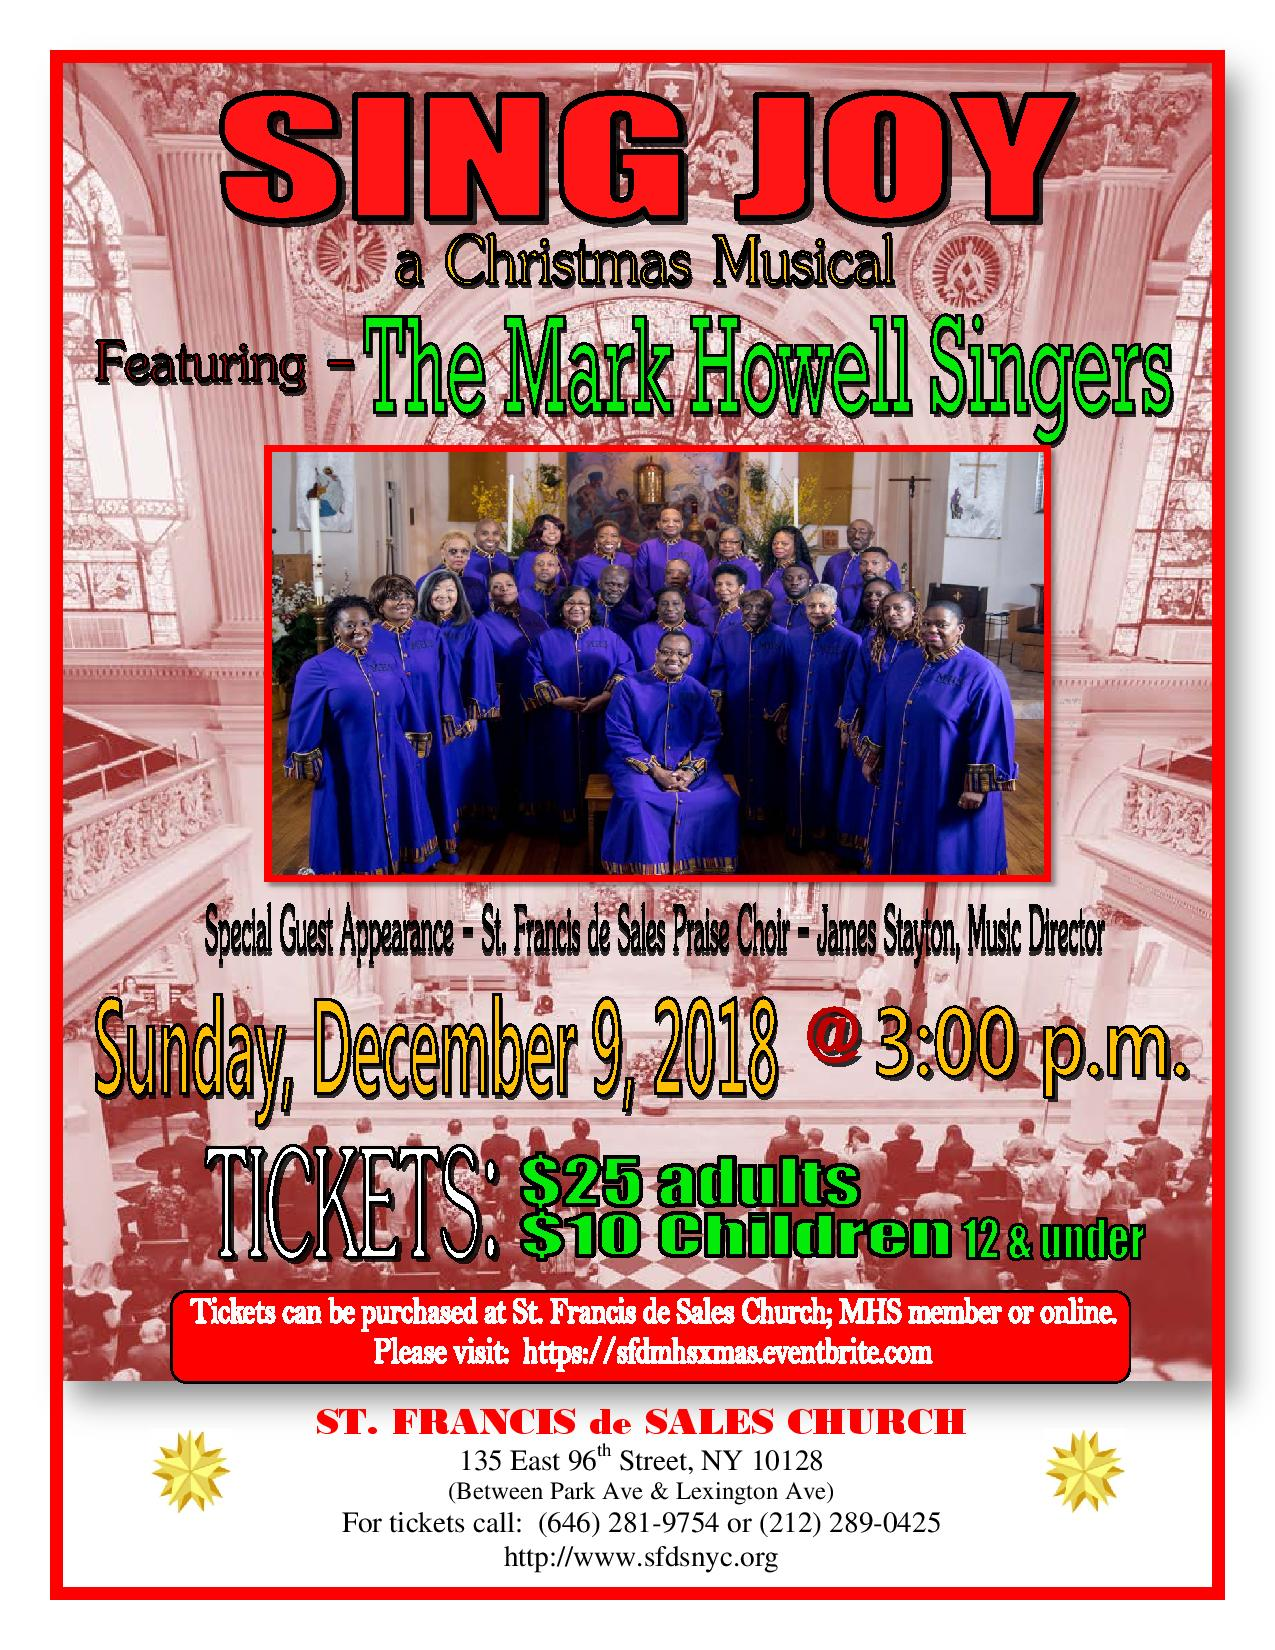 MHS Sing Joy Christmas Concert Flyer_Sunday, December 9, 2018_St. Francis_2.jpg